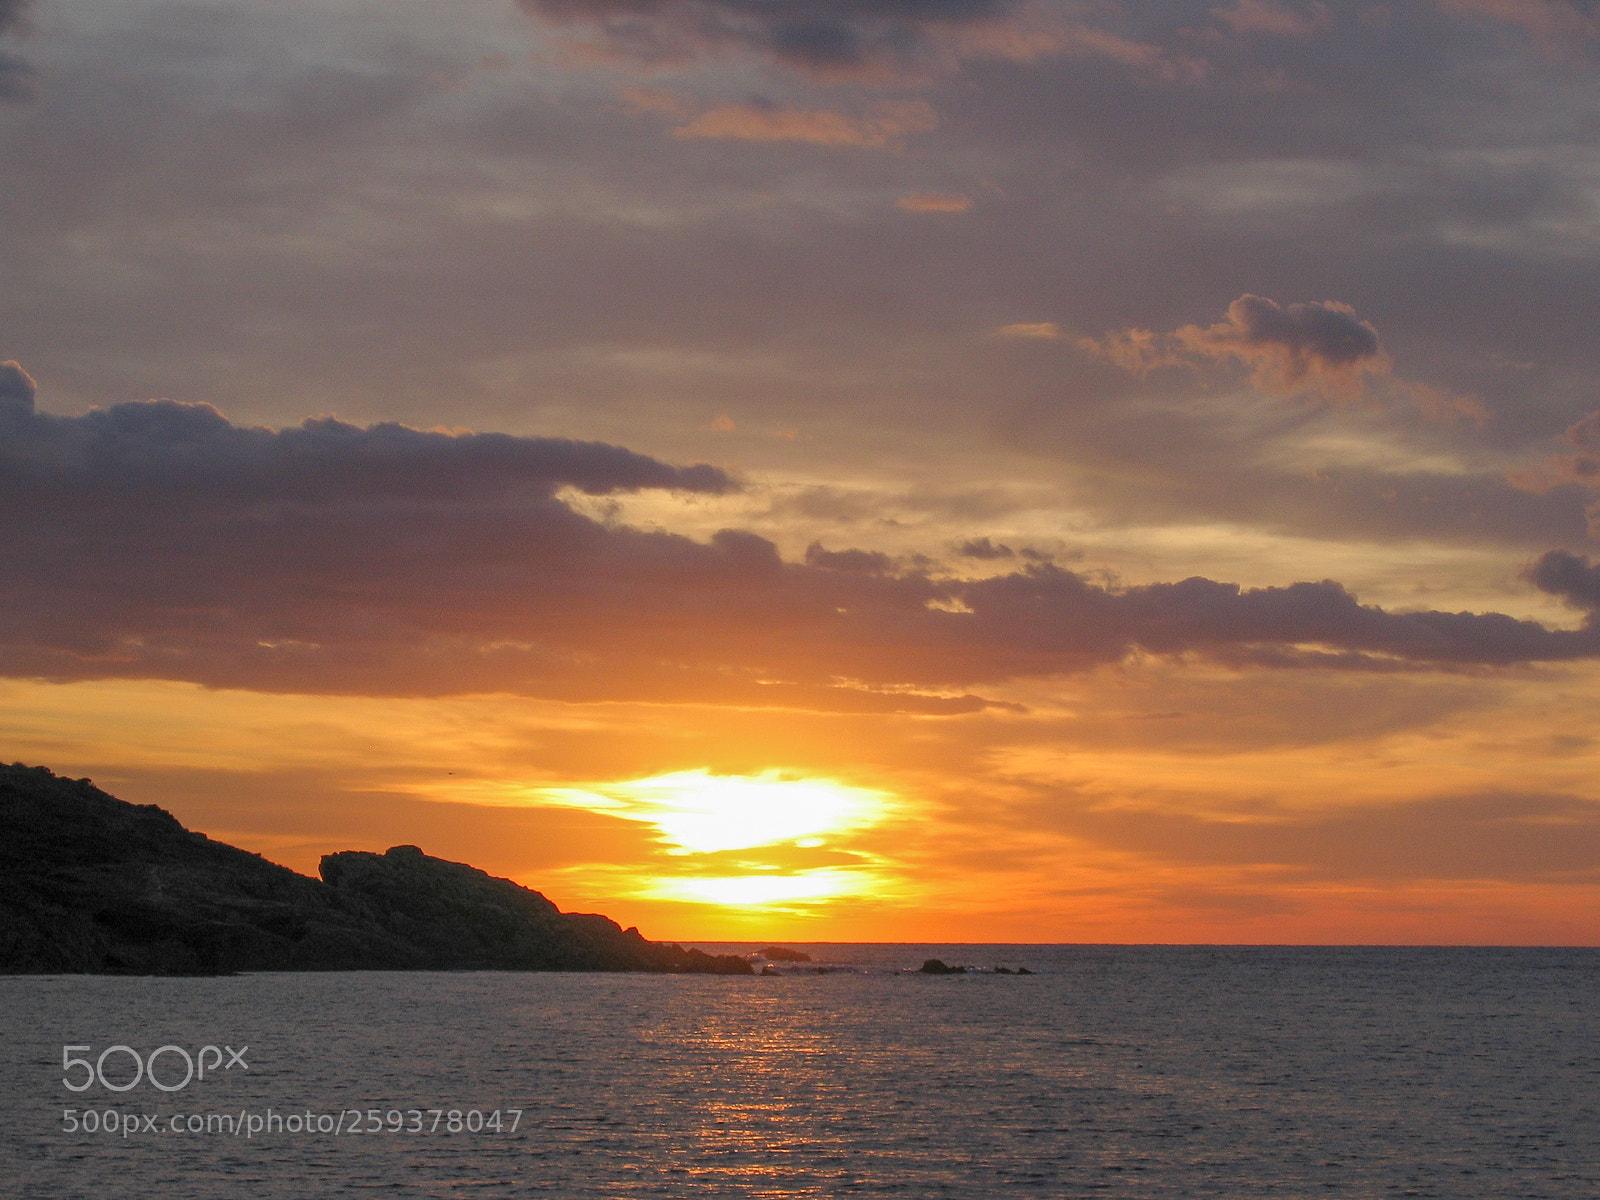 Sunset at Porquerolles, Canon POWERSHOT S50